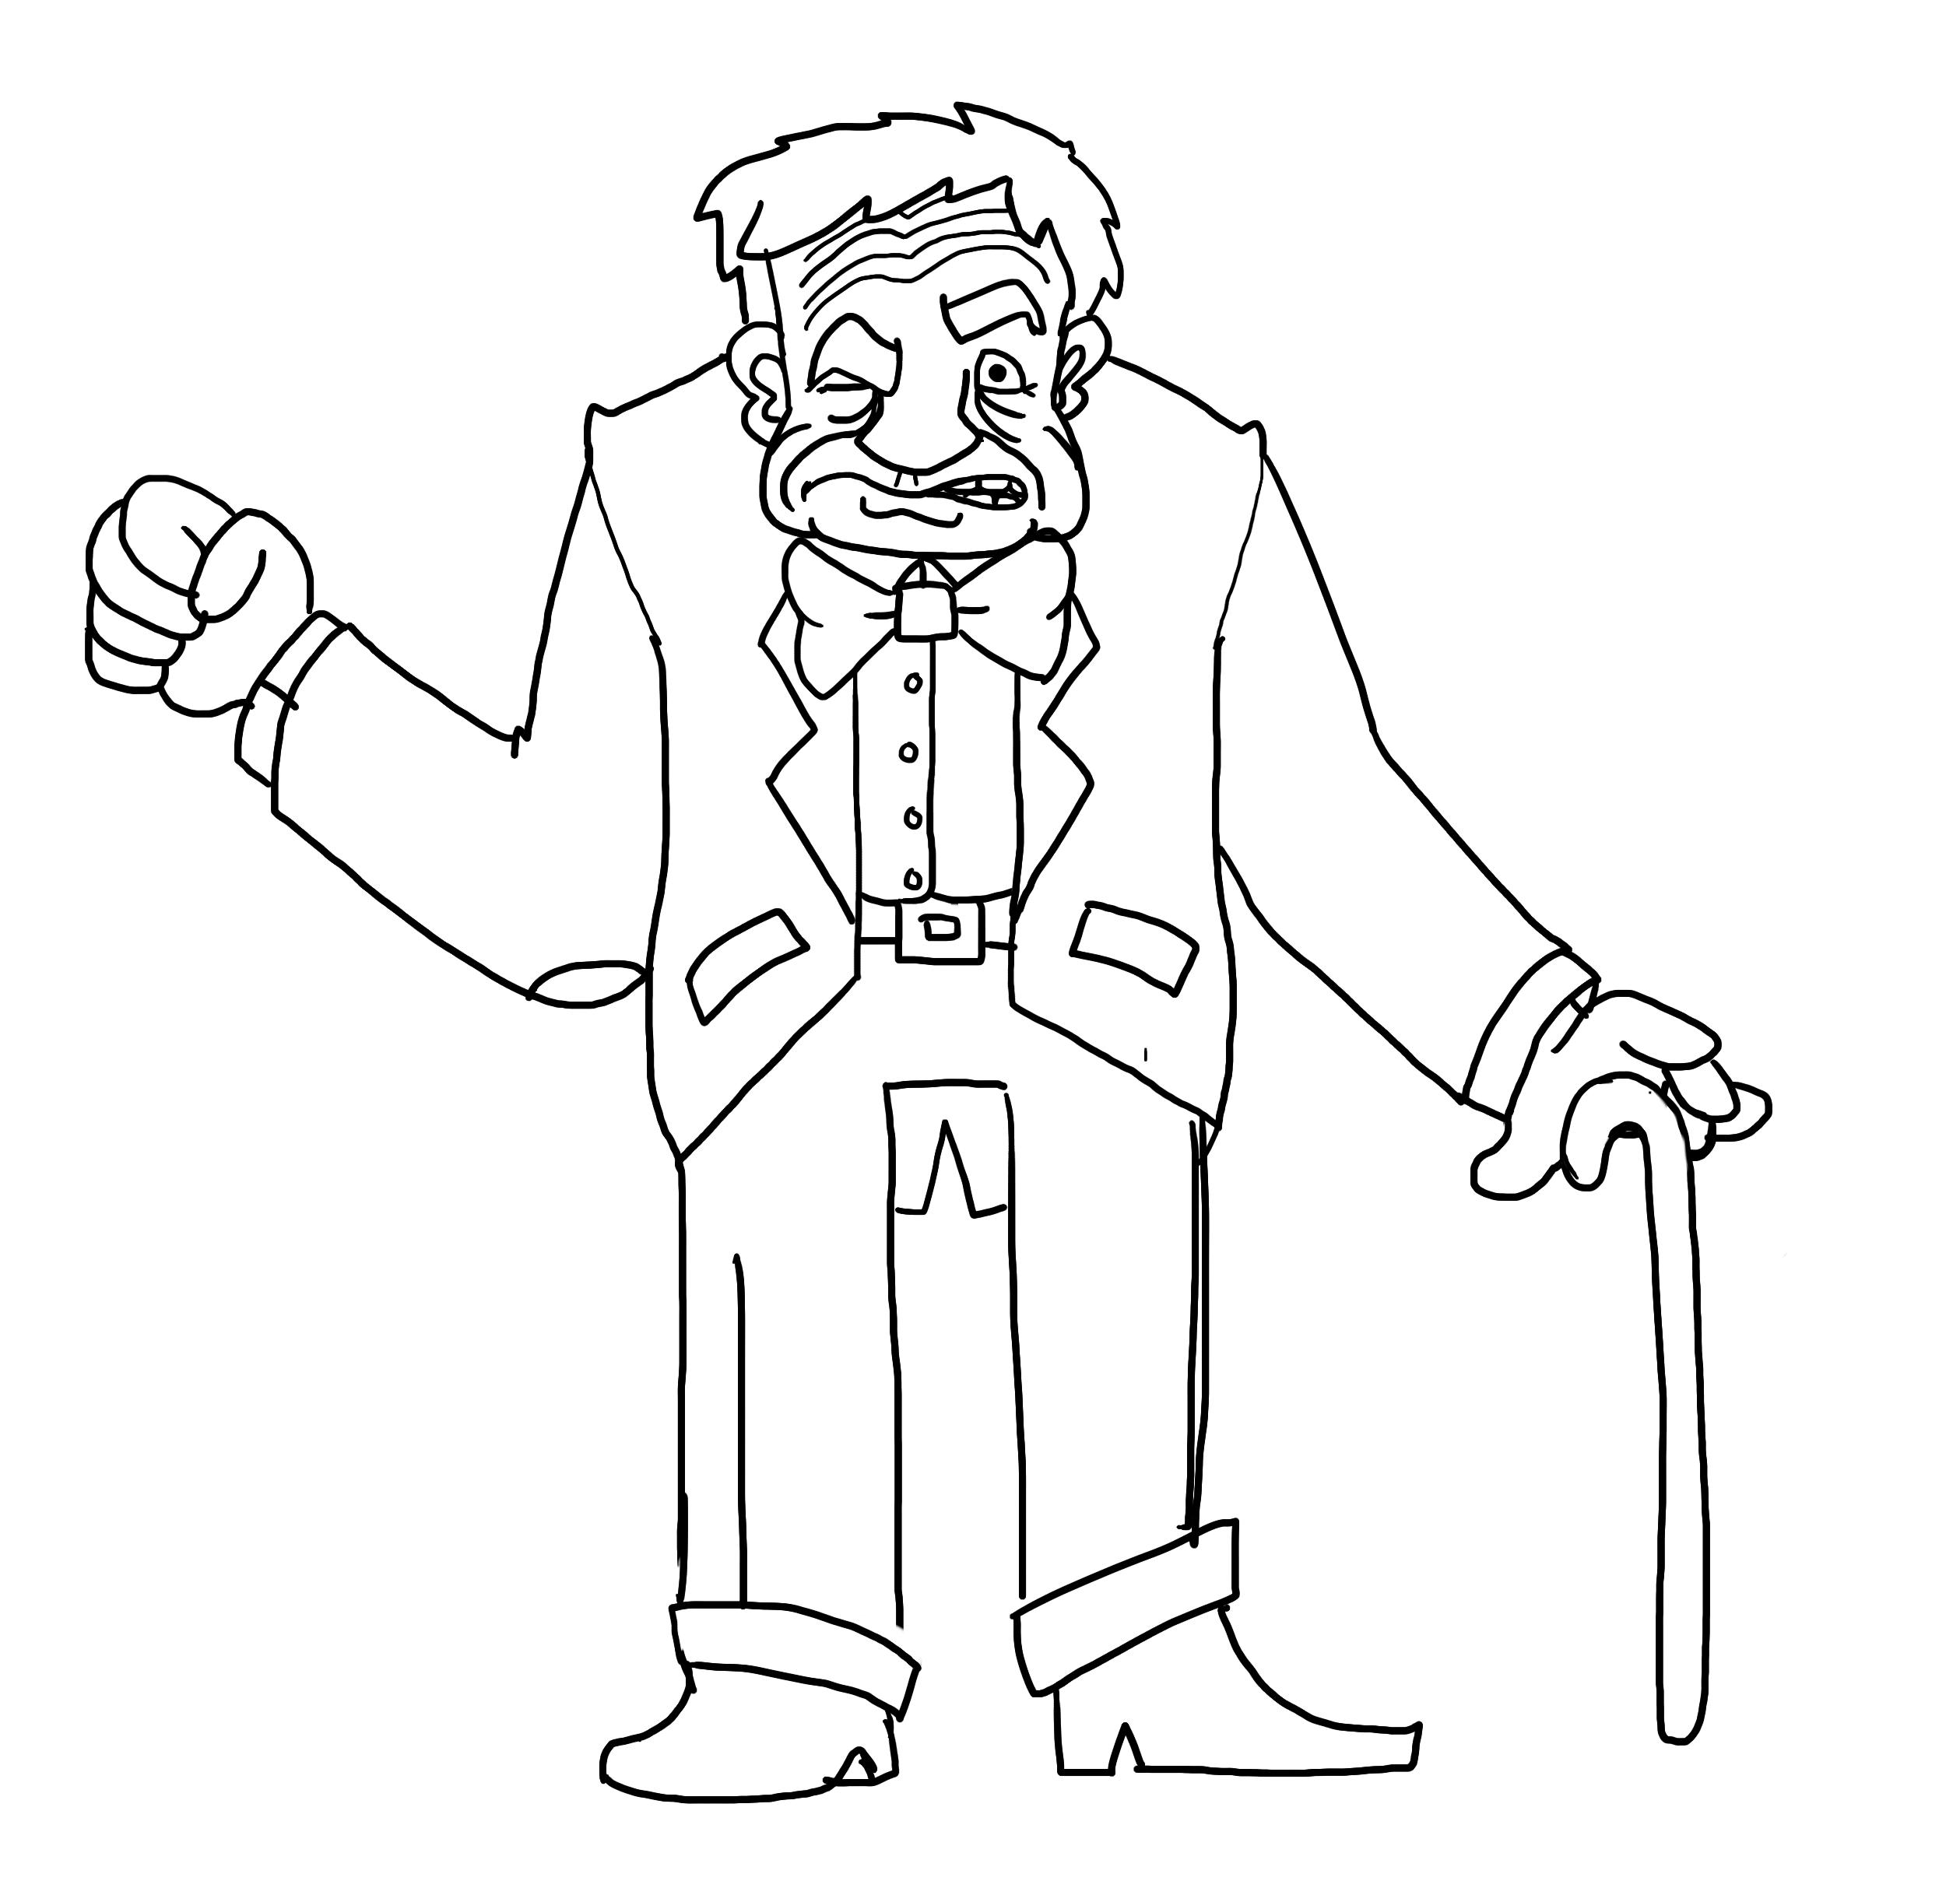 Drew a grumpy old man today. http://i.imgur pluspng.com/1nqRmjF.png - Grumpy Old Man PNG